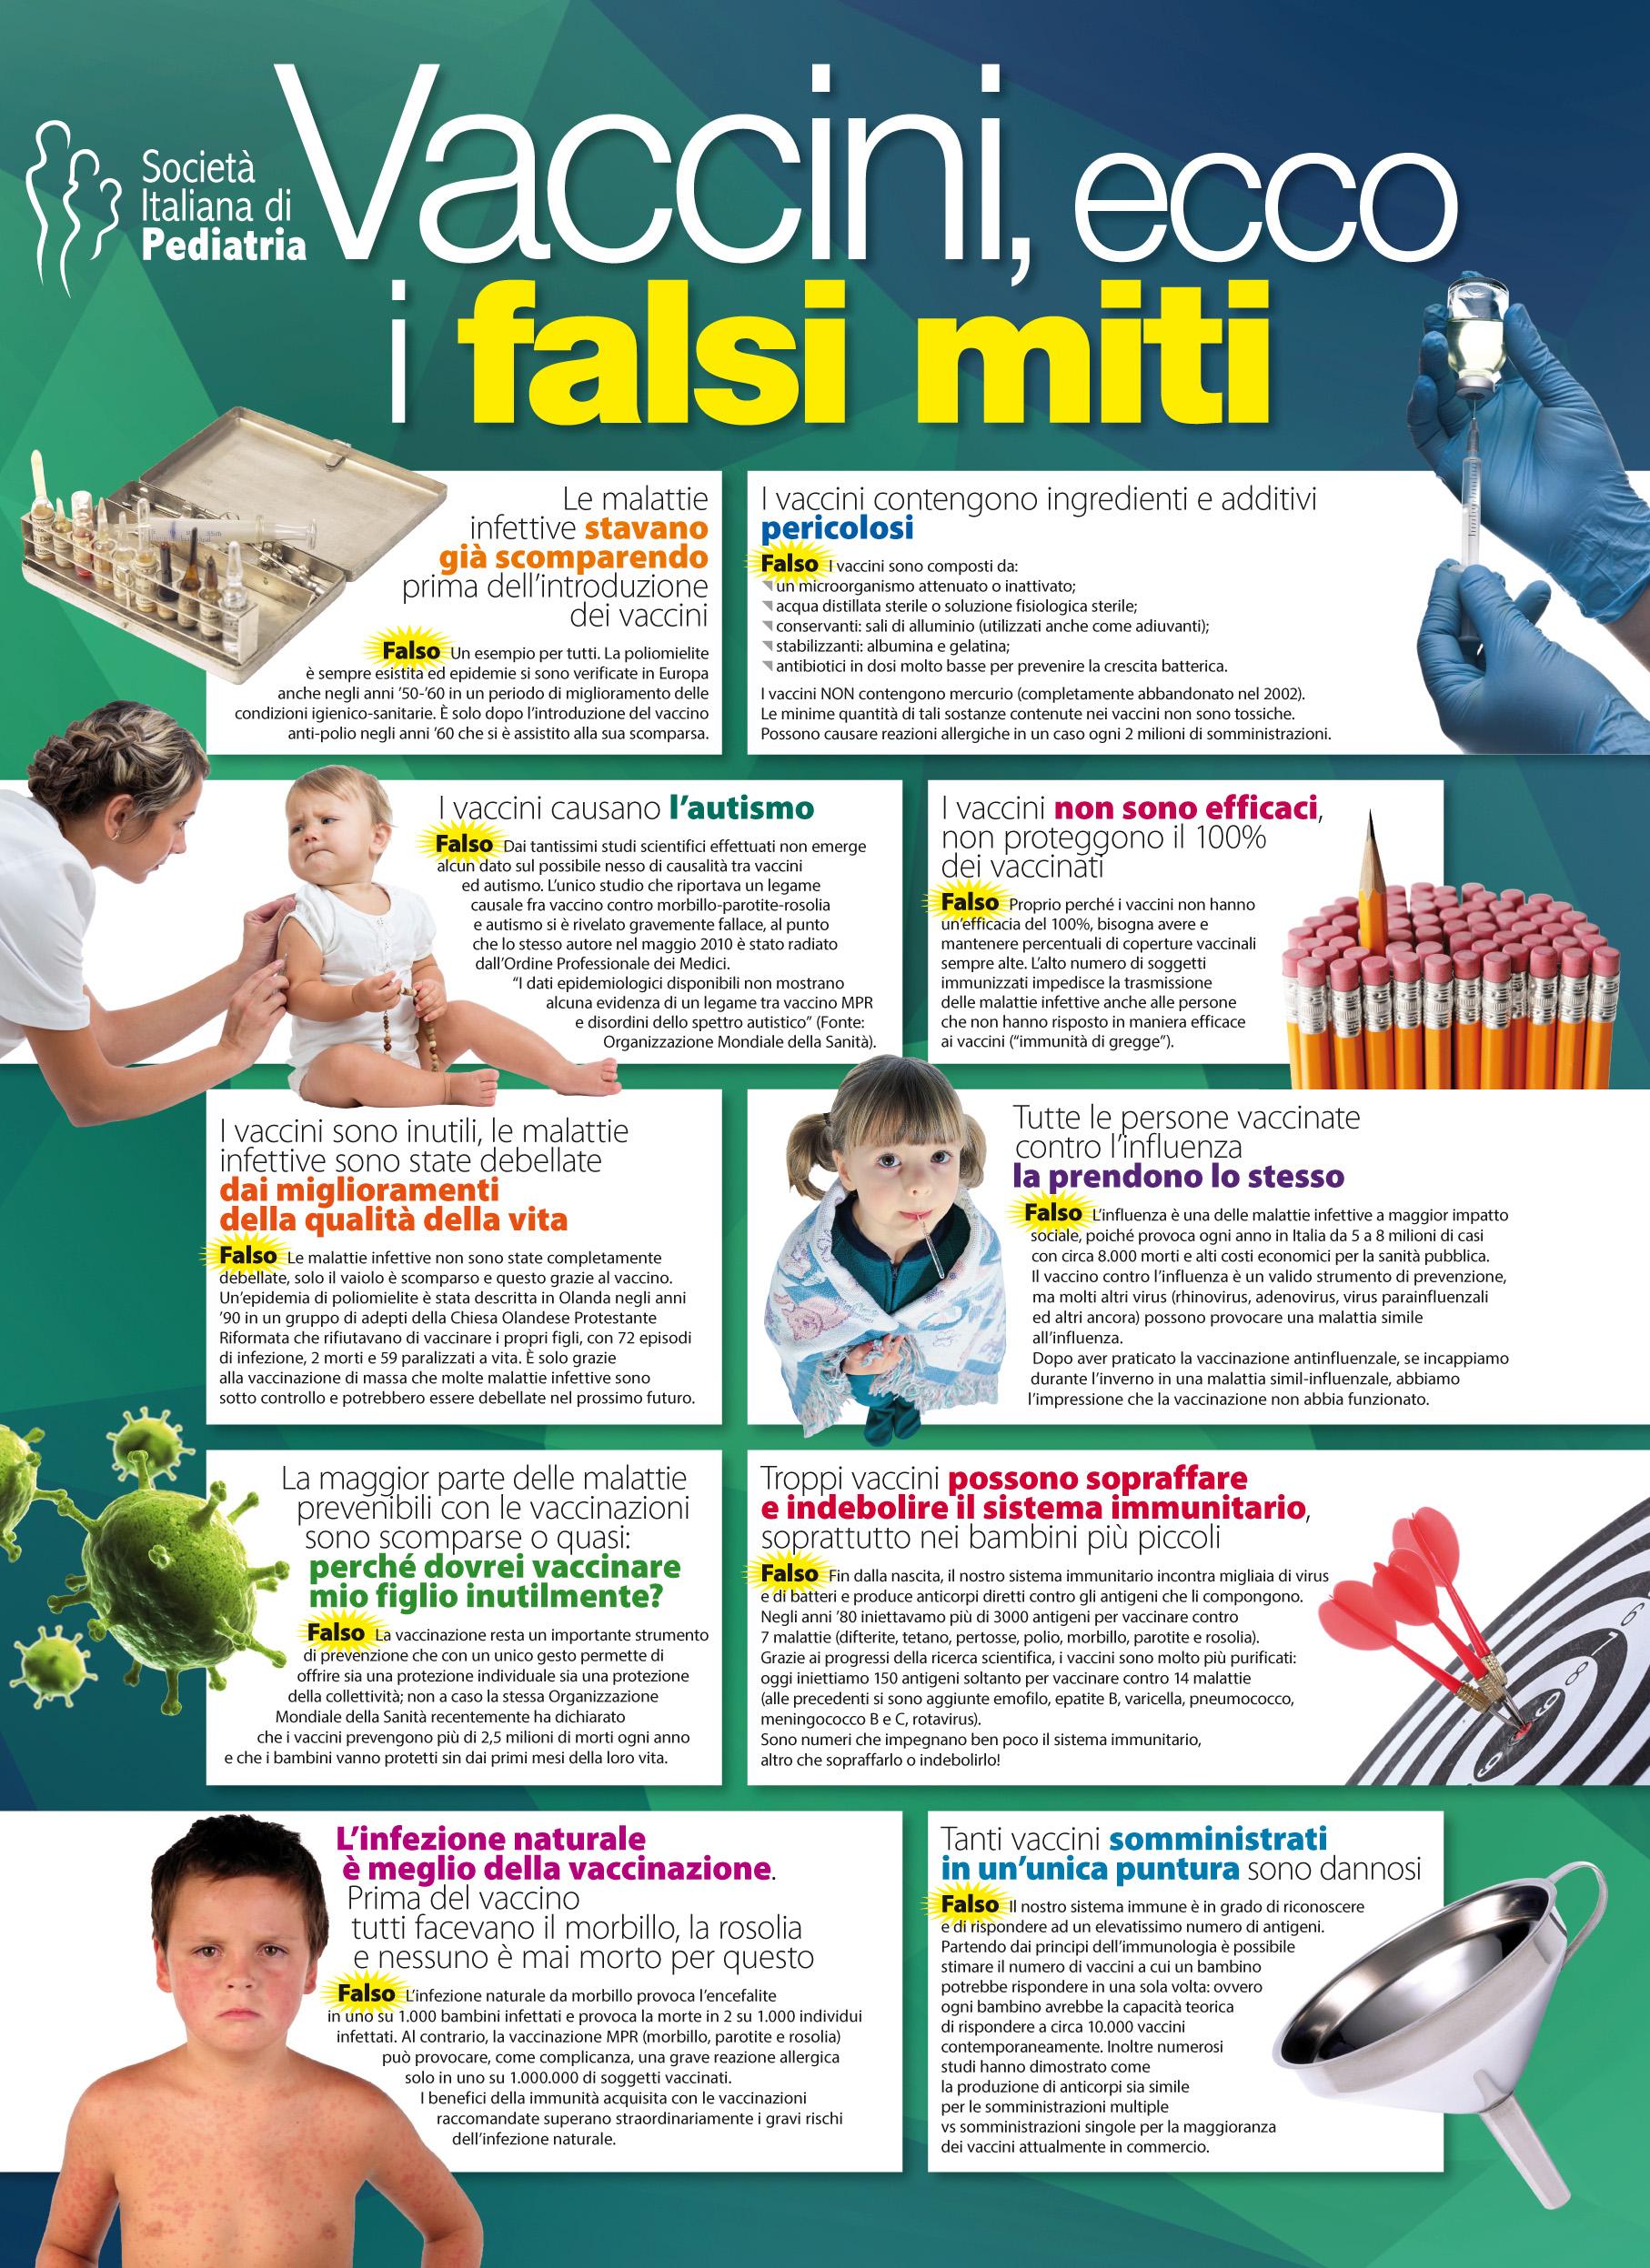 Vaccini-Falsi_miti_64x88-testobreve.indd